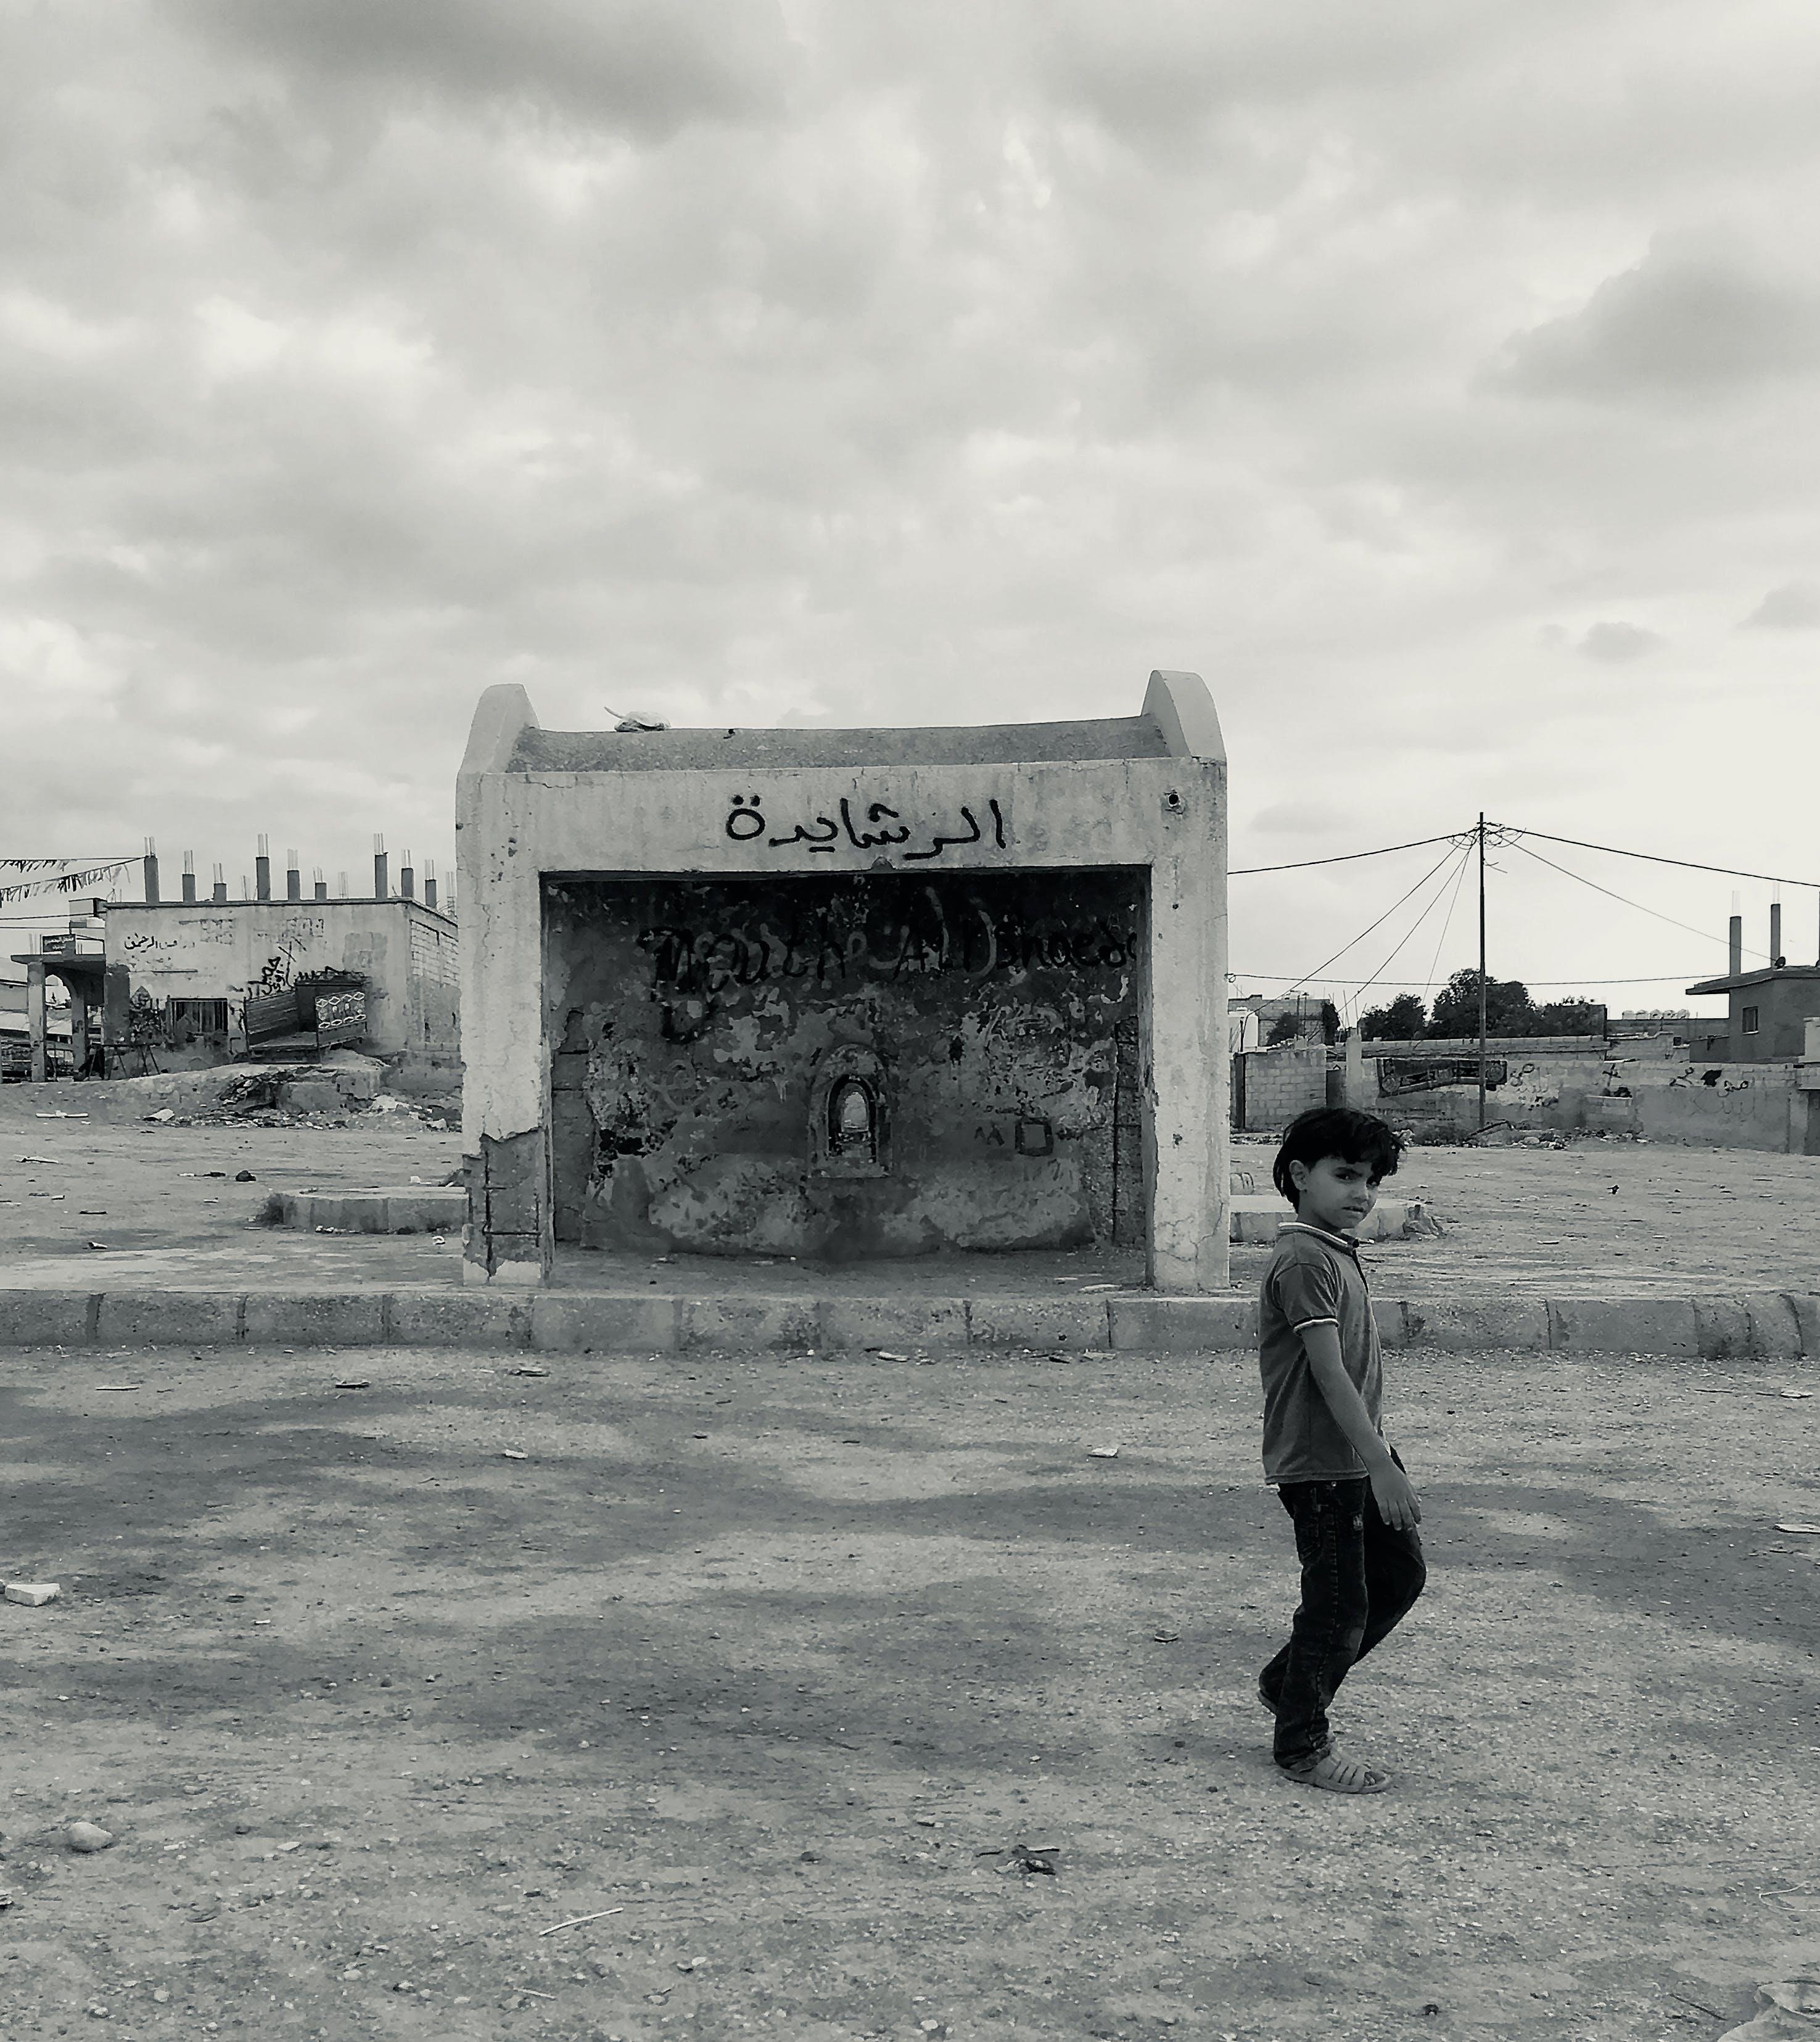 Free stock photo of black and white, boy, bus stop, run down